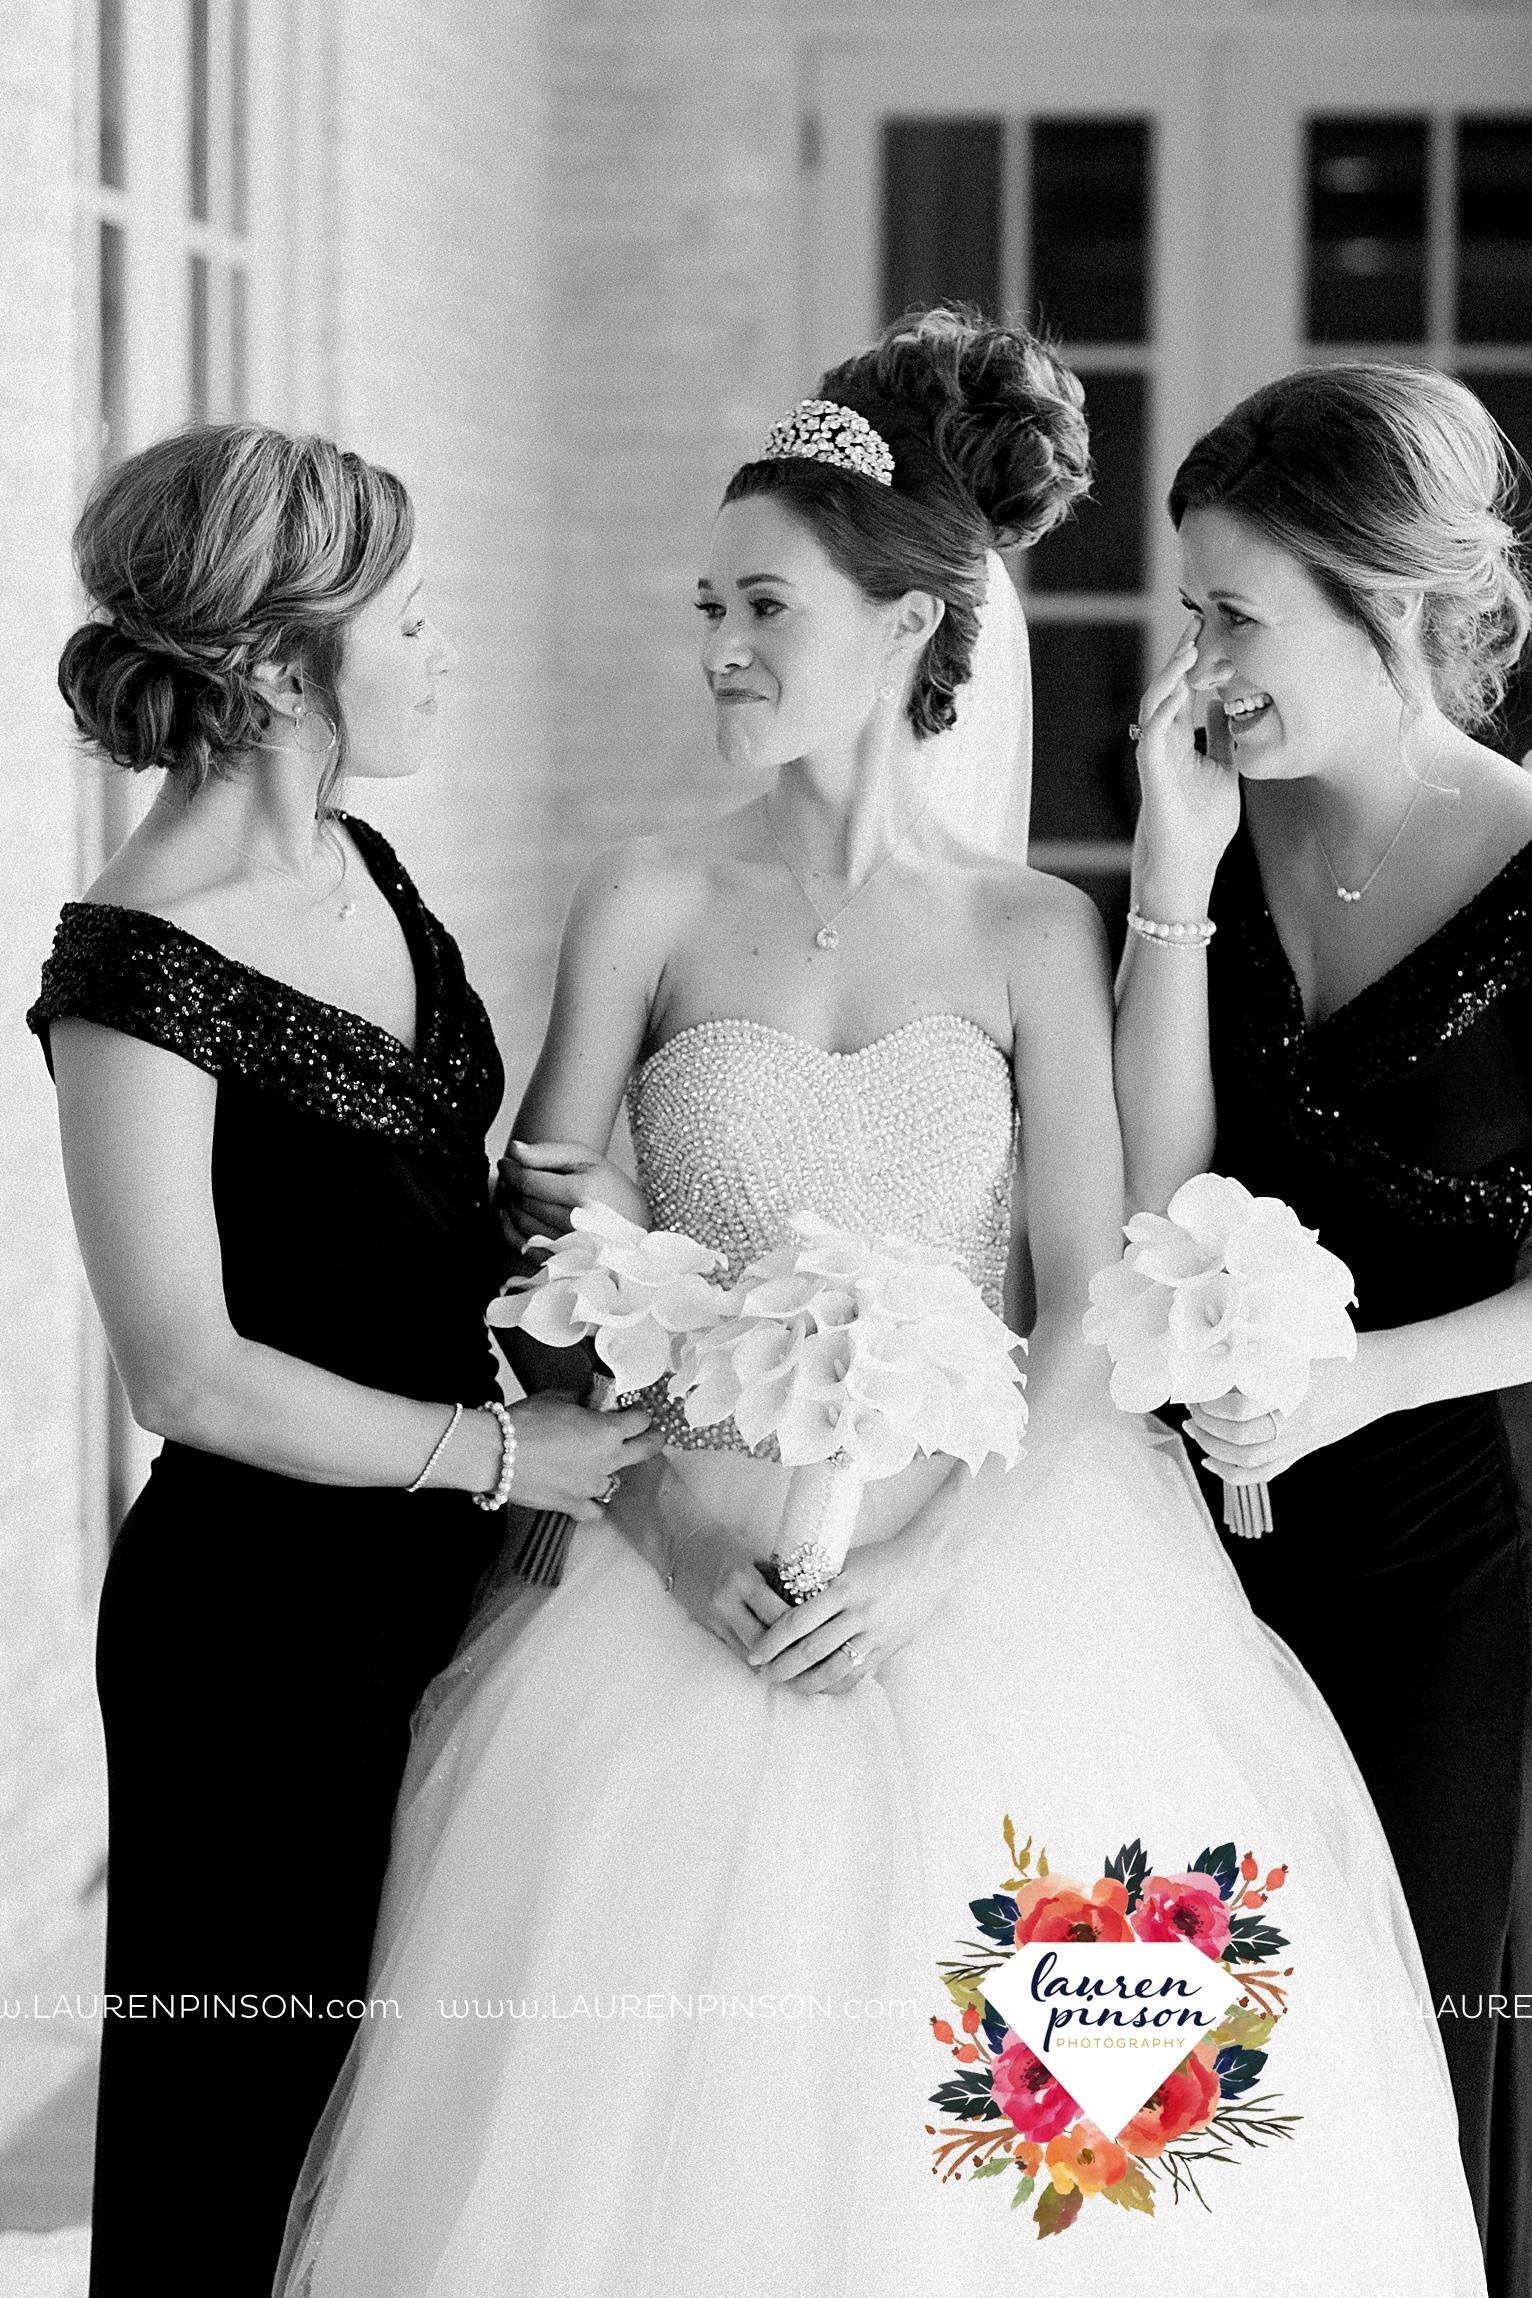 wichita-falls-texas-wedding-photographer-the-forum-by-the-kemp-mayfield-events-ulta-gold-glitter_2843.jpg